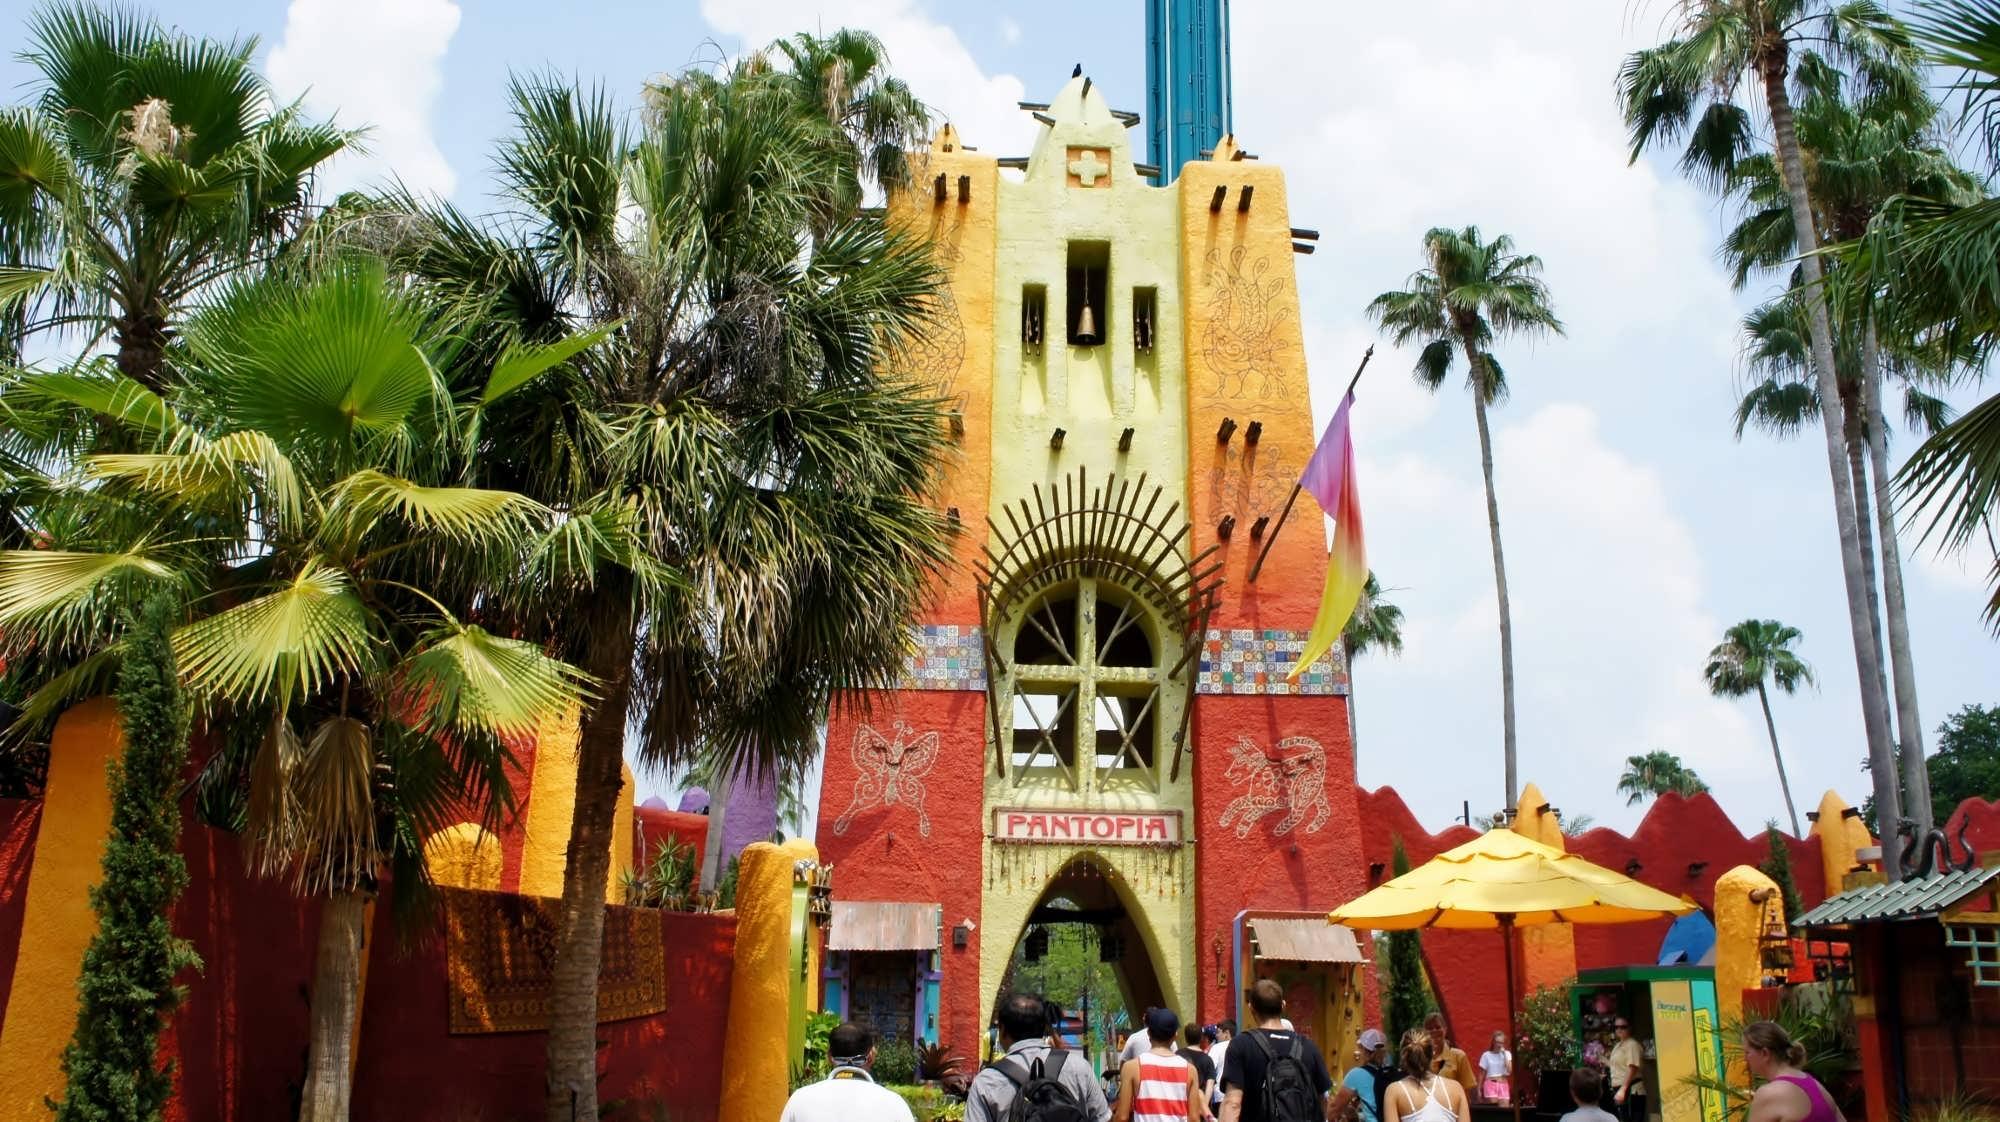 BGT Pantopia 1 oi - Busch Gardens Tampa New Ride 2014